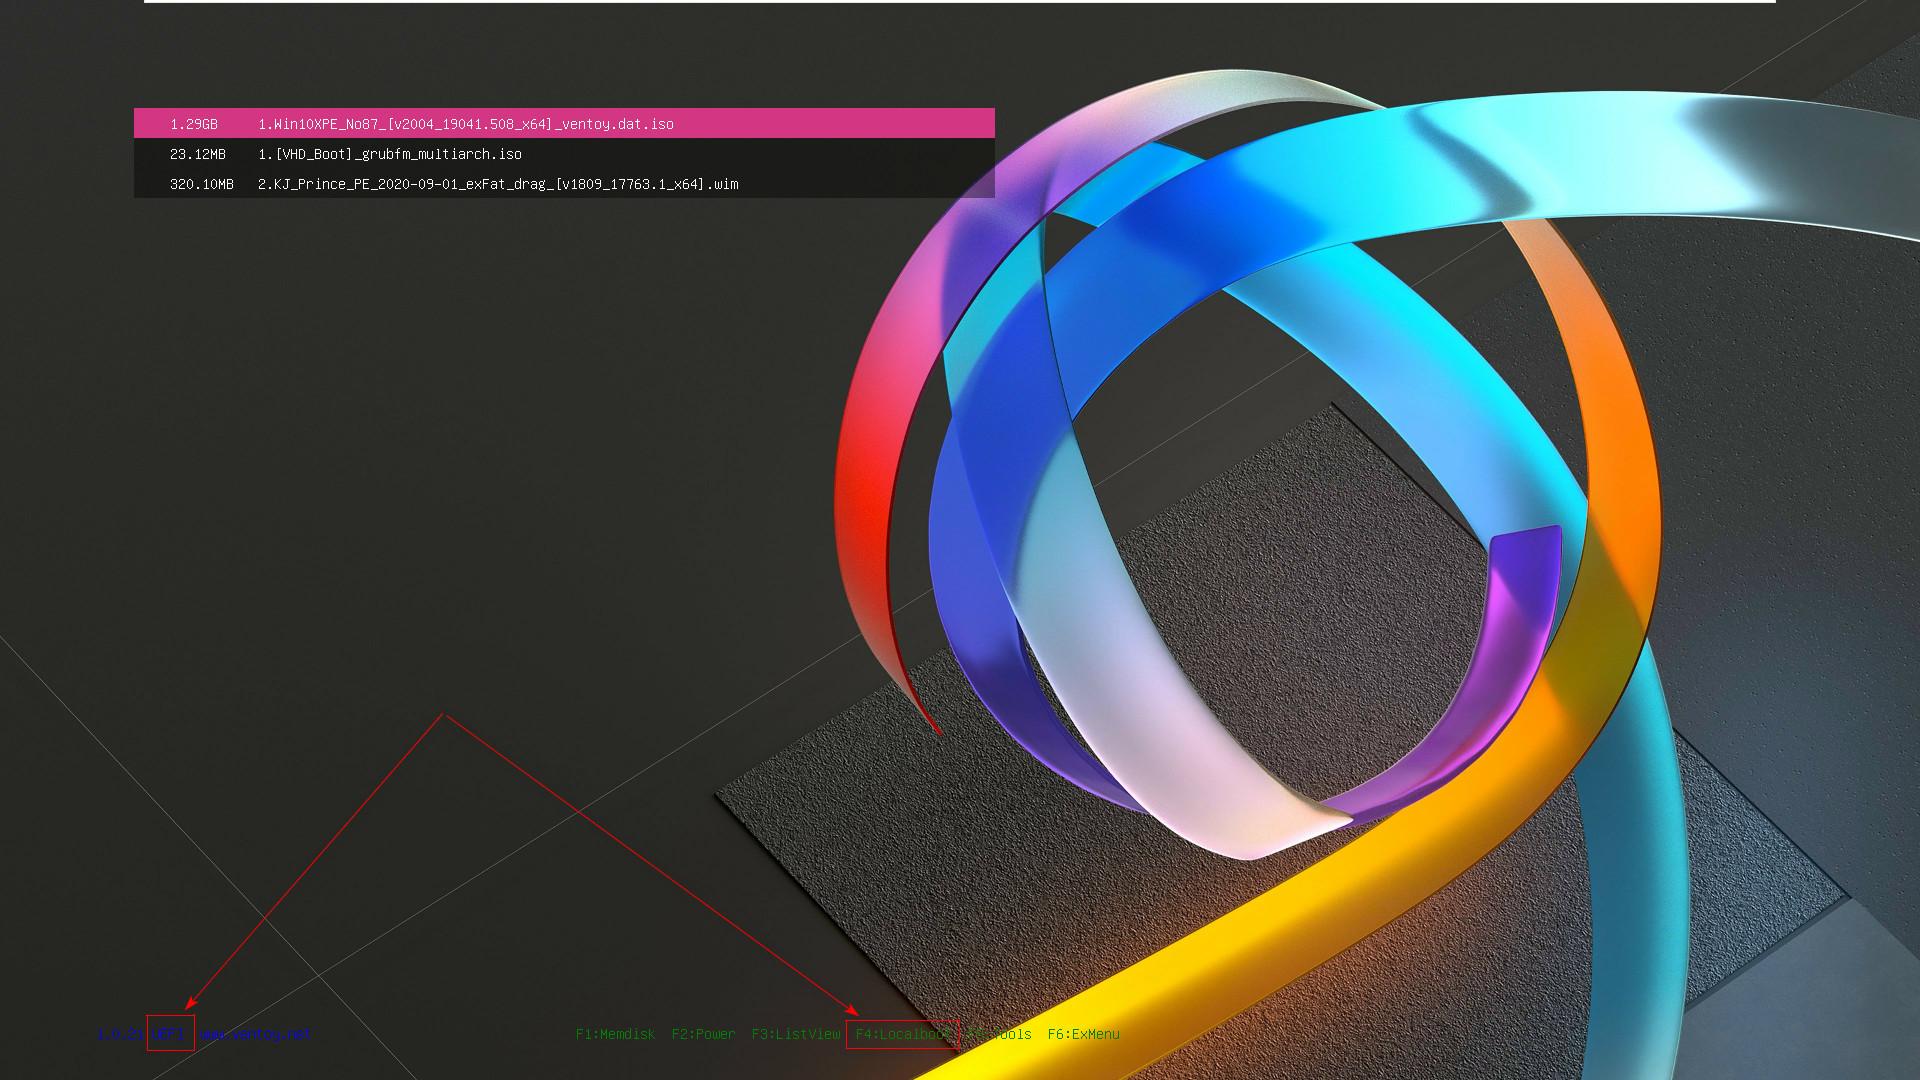 AIO Boot와 Ventoy 하나의 디스크에 합치기 - bios 모드 연동 문제 해결 - Ventoy 기준으로 AIO Boot는 해결함 2020-09-18_074659.jpg